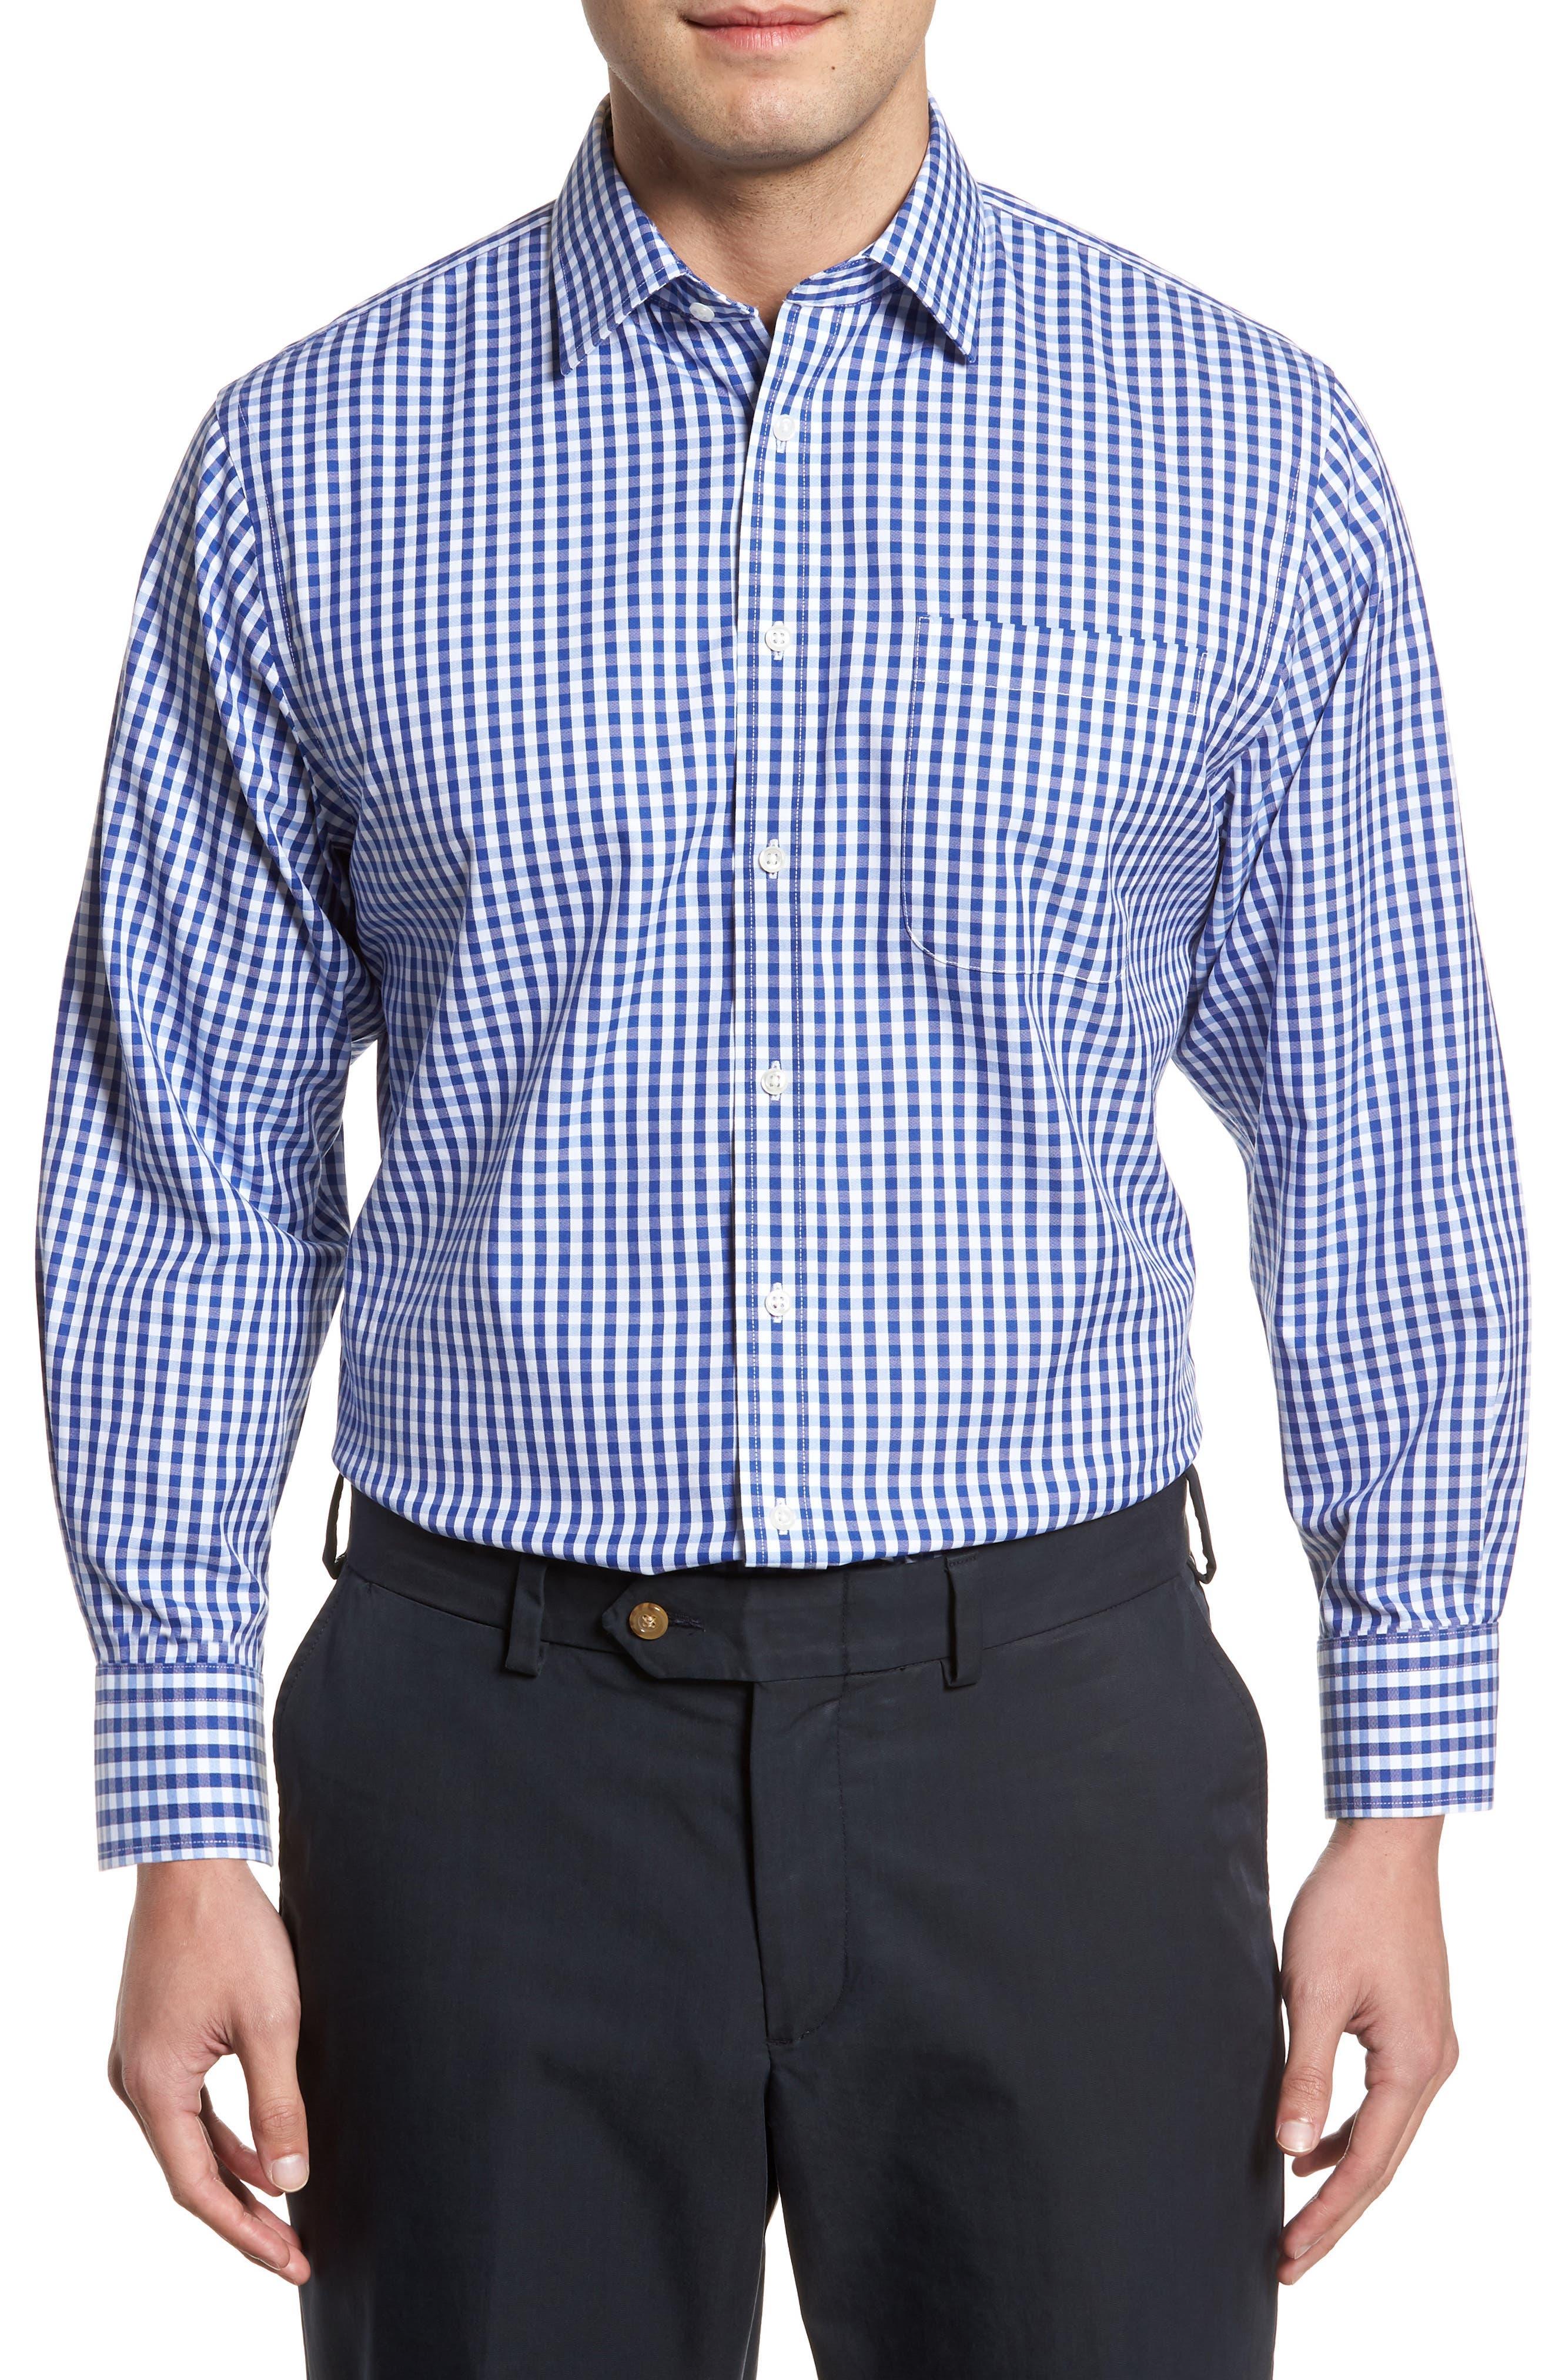 Smartcare<sup>™</sup> Traditional Fit Check Dress Shirt,                             Main thumbnail 1, color,                             Blue Mazarine